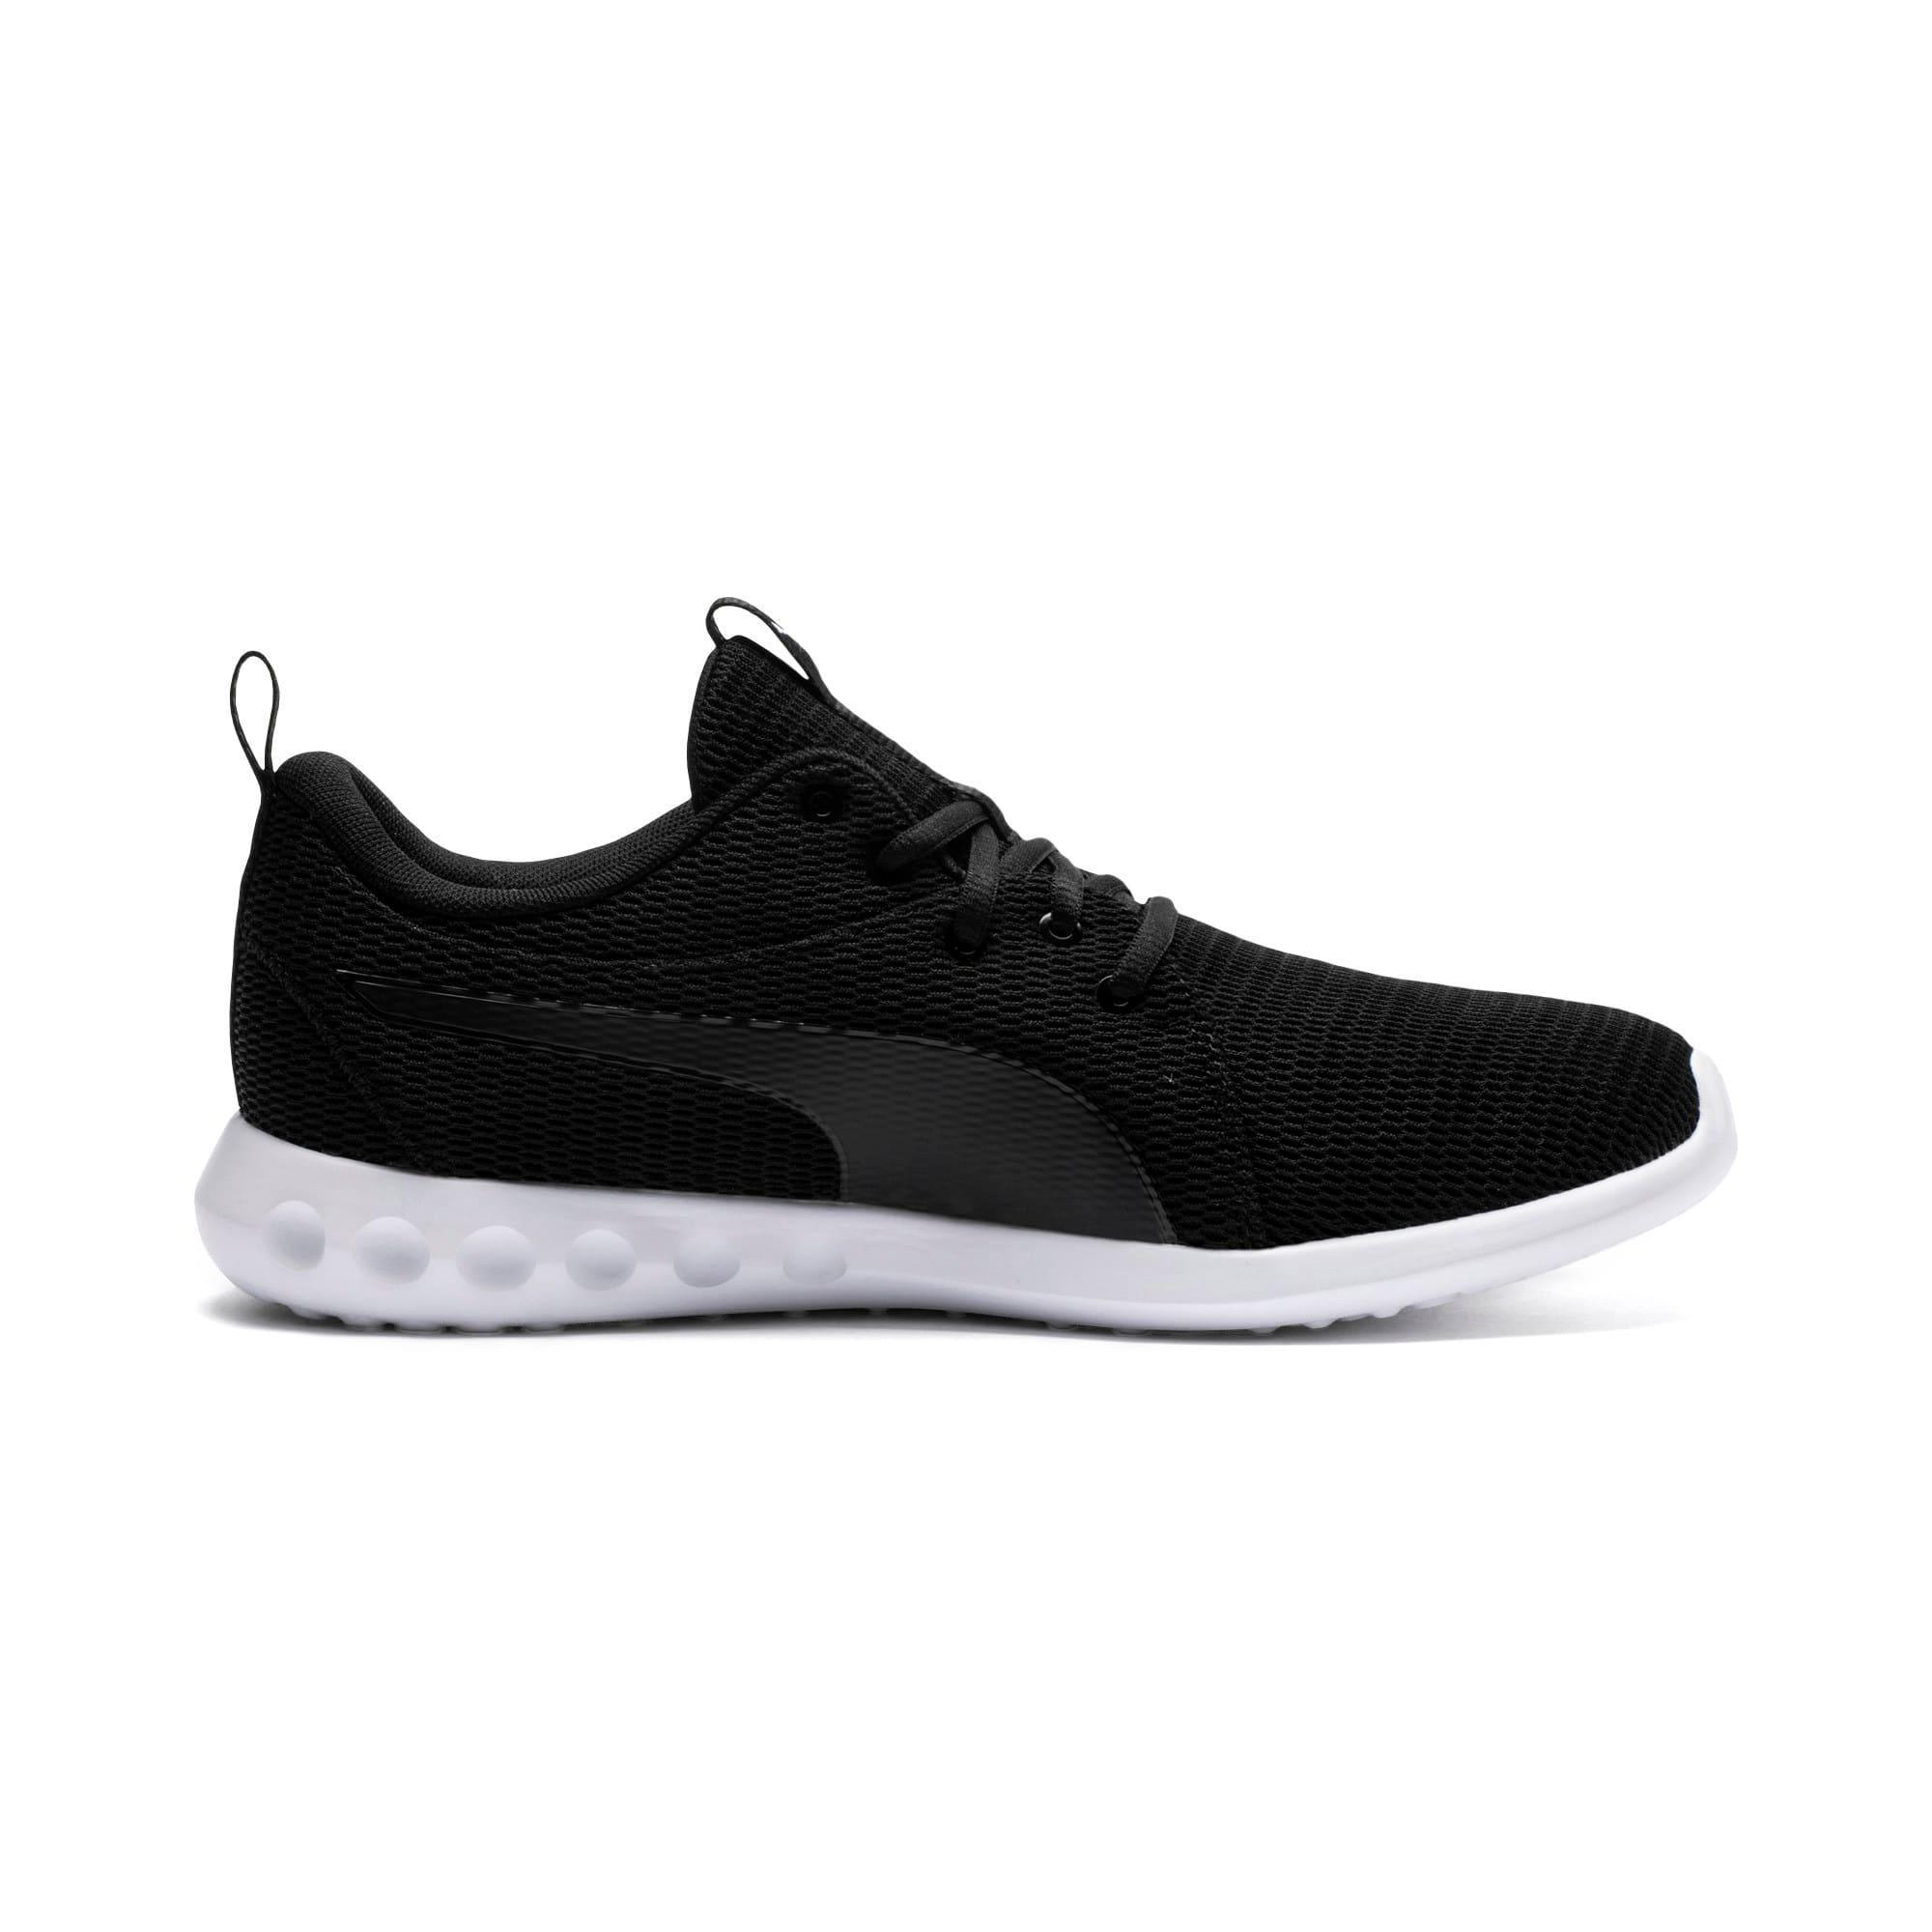 Thumbnail 5 of Carson 2 New Core Men's Running Shoes, Puma Black-Puma White, medium